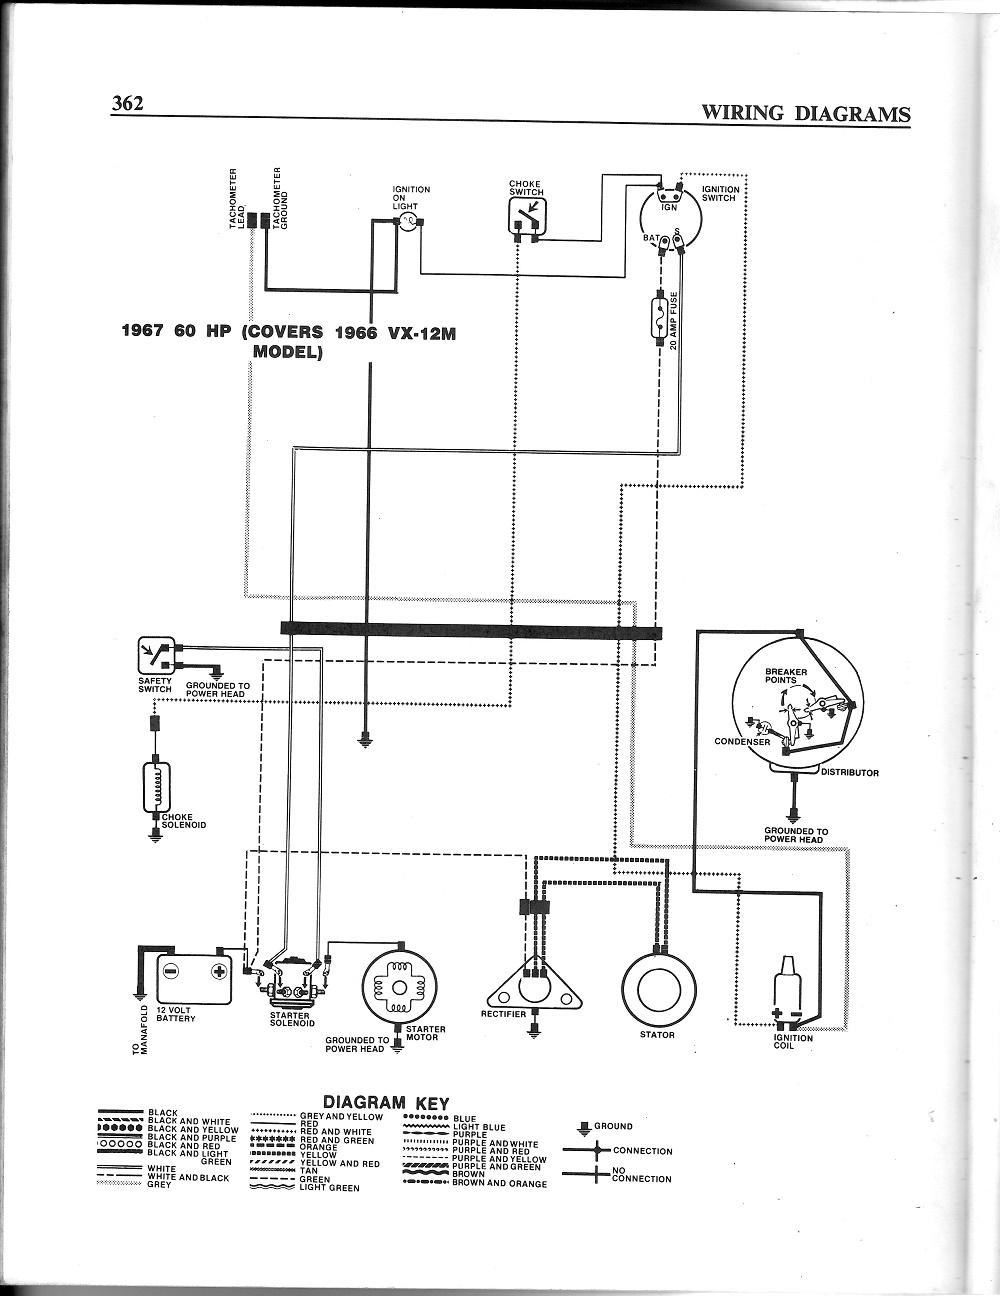 medium resolution of lark wiring diagram wiring library wiring diagram for 1964 studebaker postal zip van 8e5 fc model